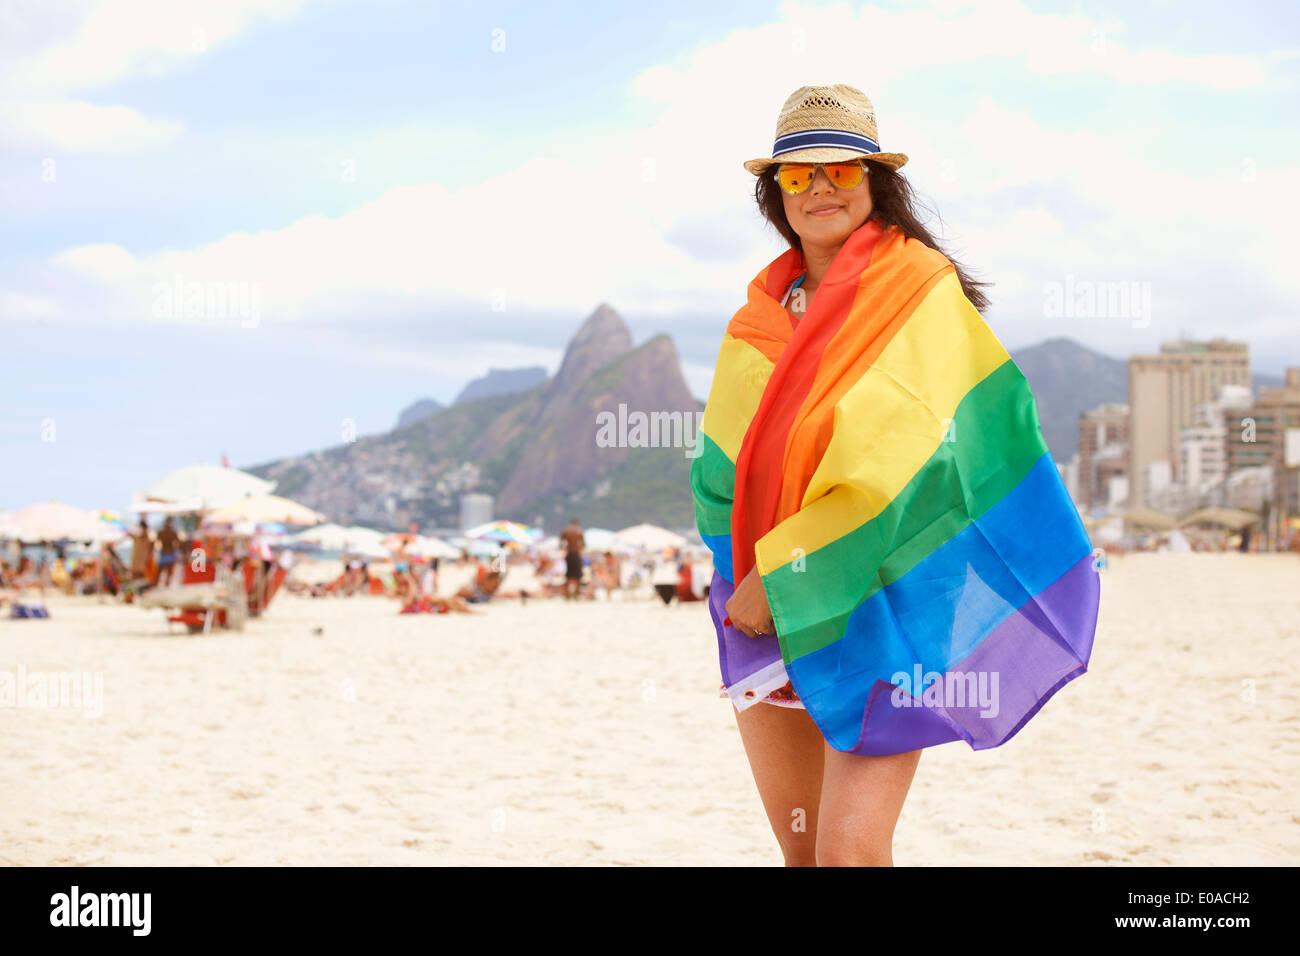 Portrait of mature woman wrapped in multicolored flag, Ipanema beach, Rio De Janeiro, Brazil - Stock Image